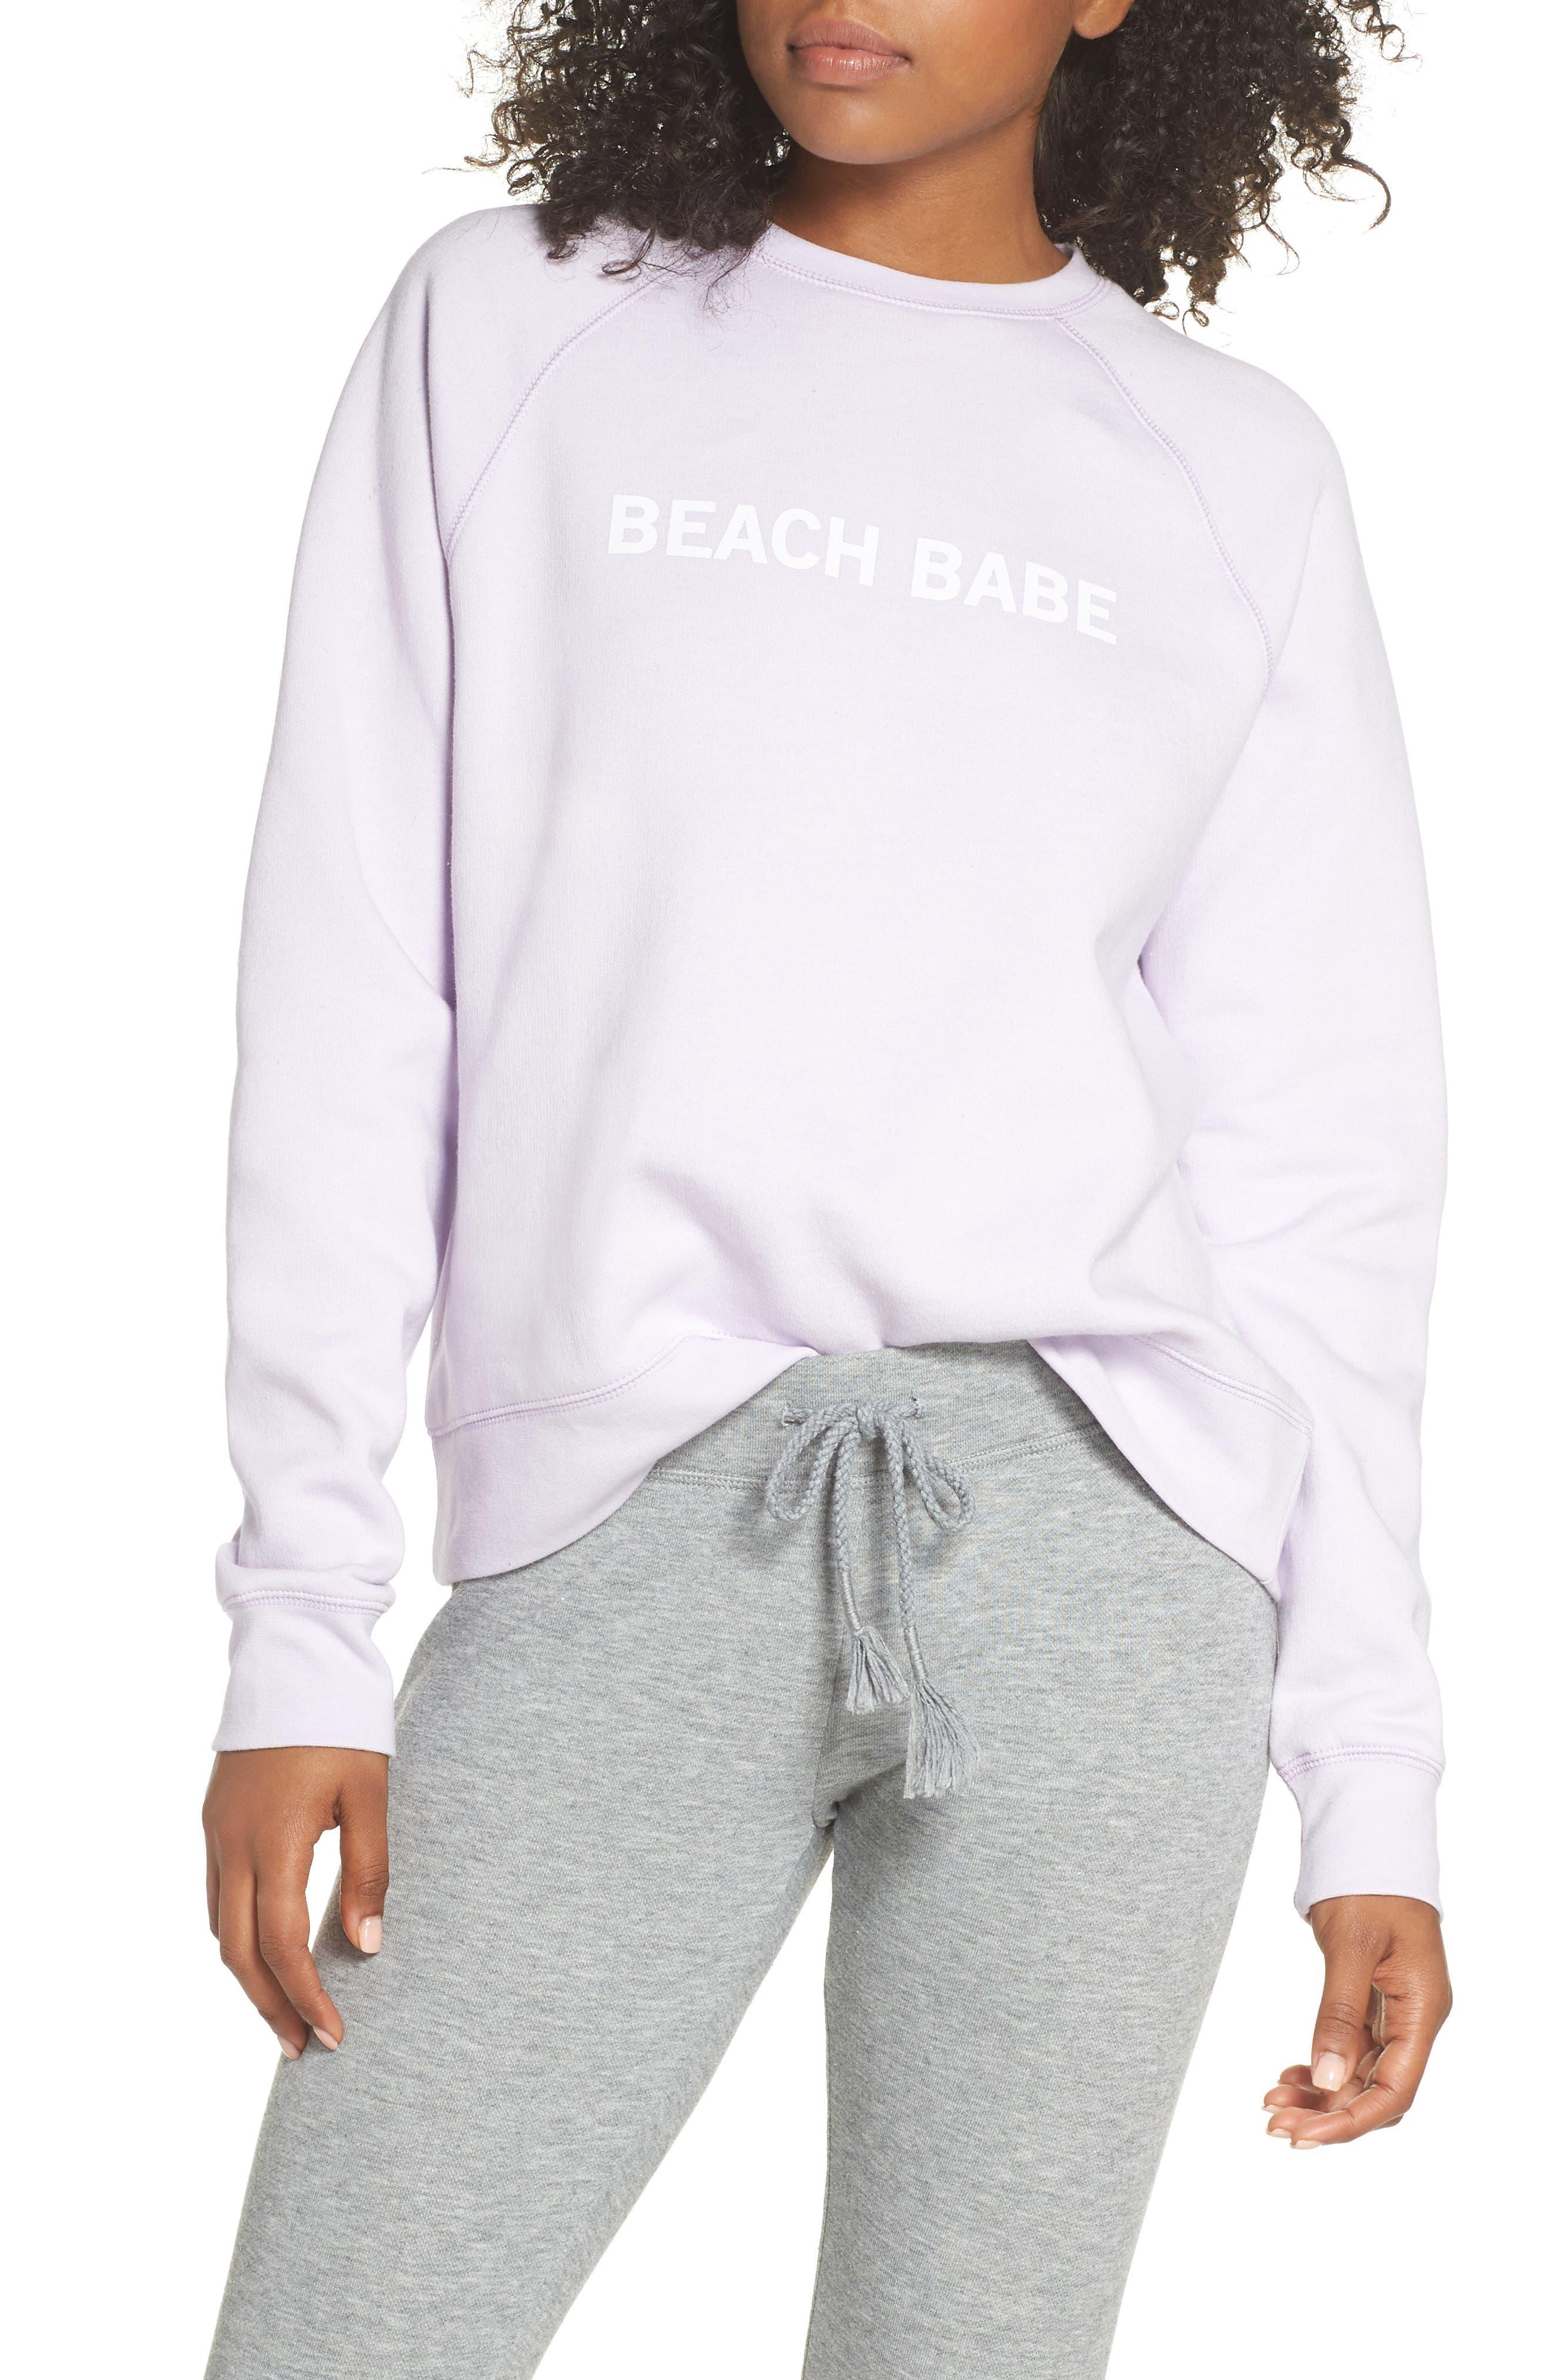 Beach Babe Middle Sister Crewneck Sweatshirt,                             Main thumbnail 1, color,                             Soft Lavender